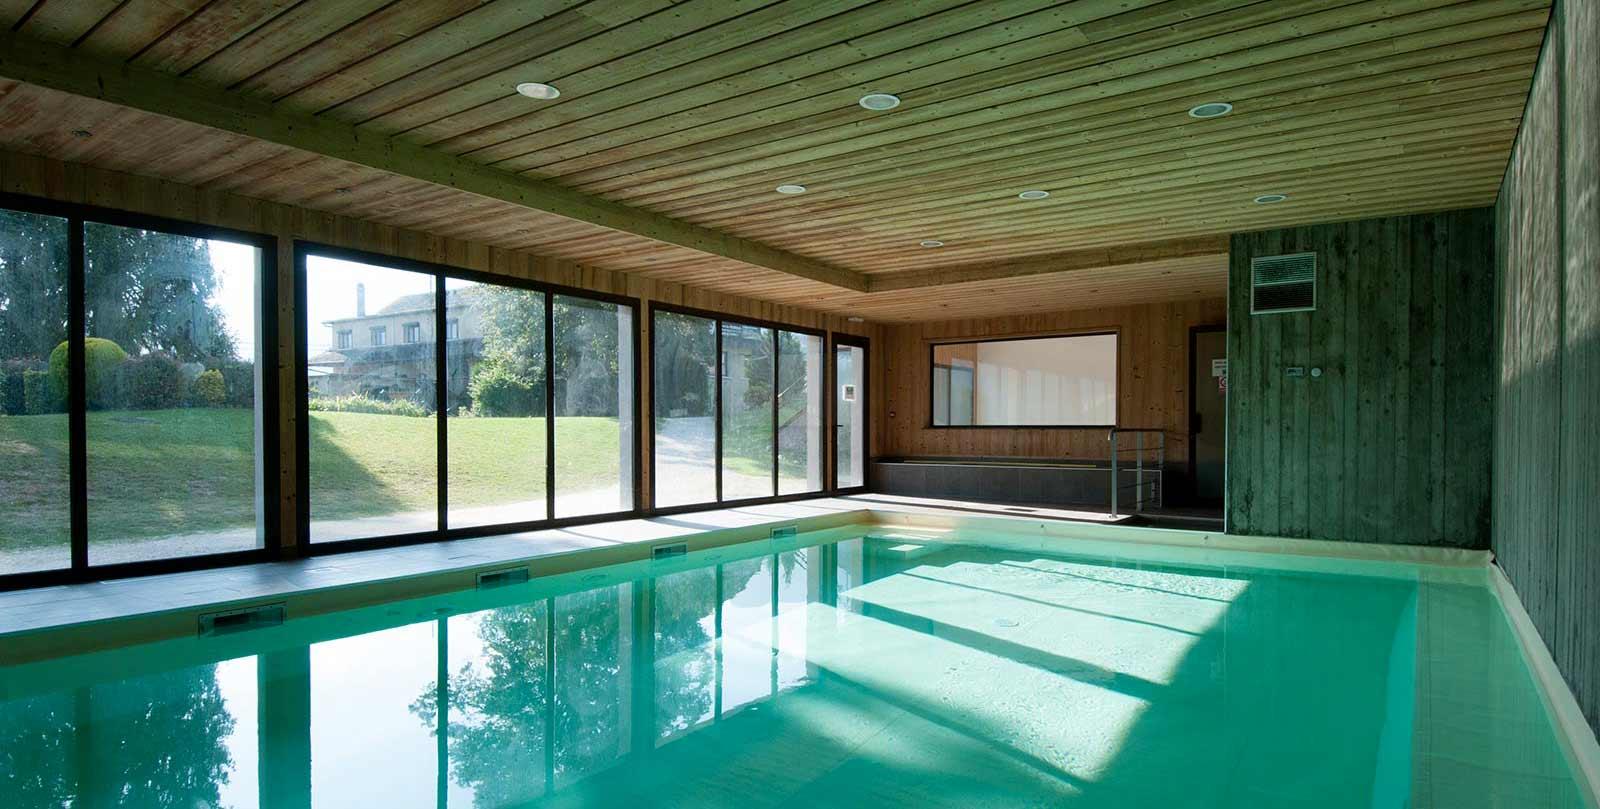 r sidence h teli re les ch taigniers avec espace d tente spa piscine int rieure lac annecy. Black Bedroom Furniture Sets. Home Design Ideas